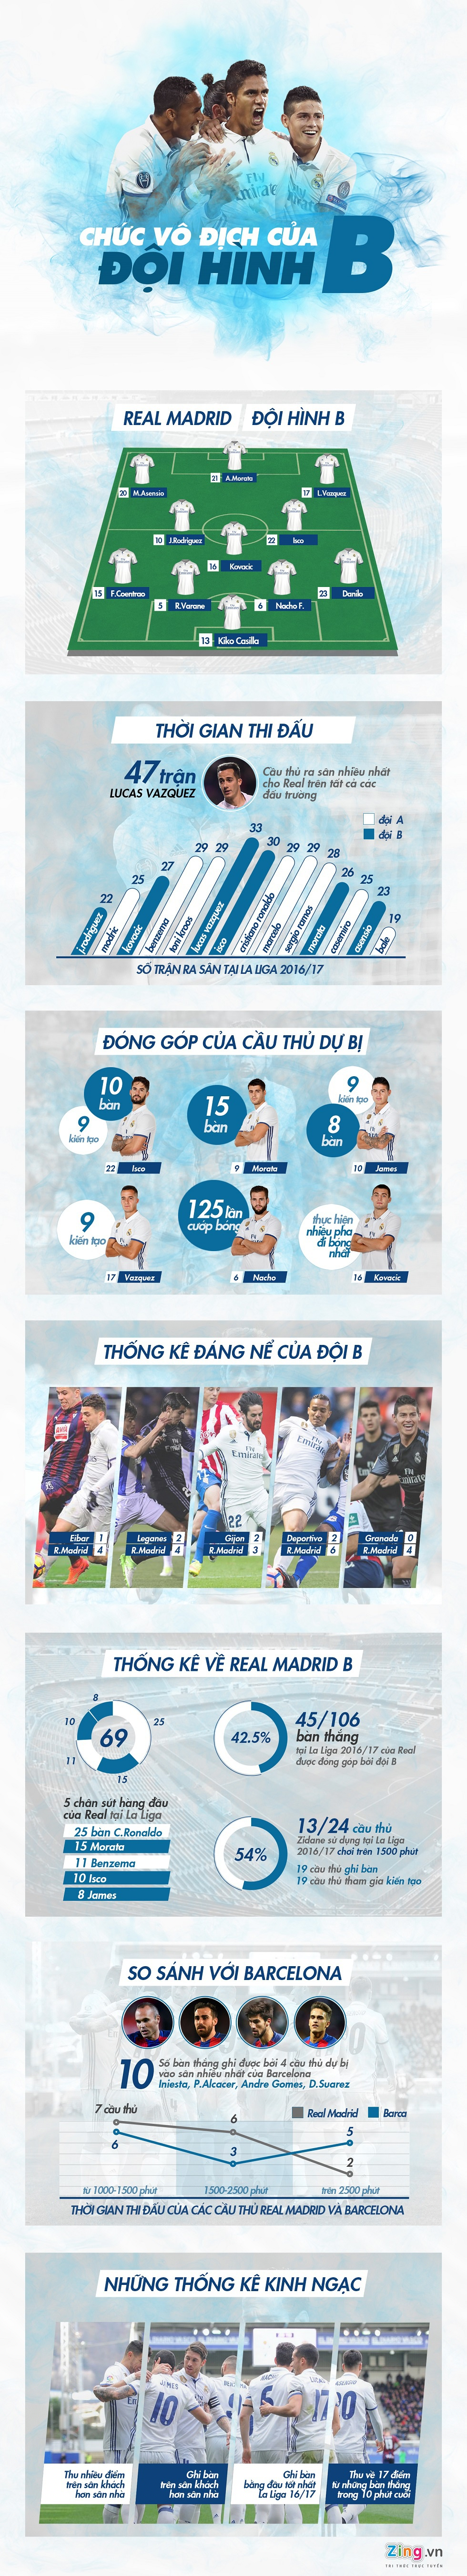 Infographic: Doi hinh B giai con khat 60 thang cua Real hinh anh 1